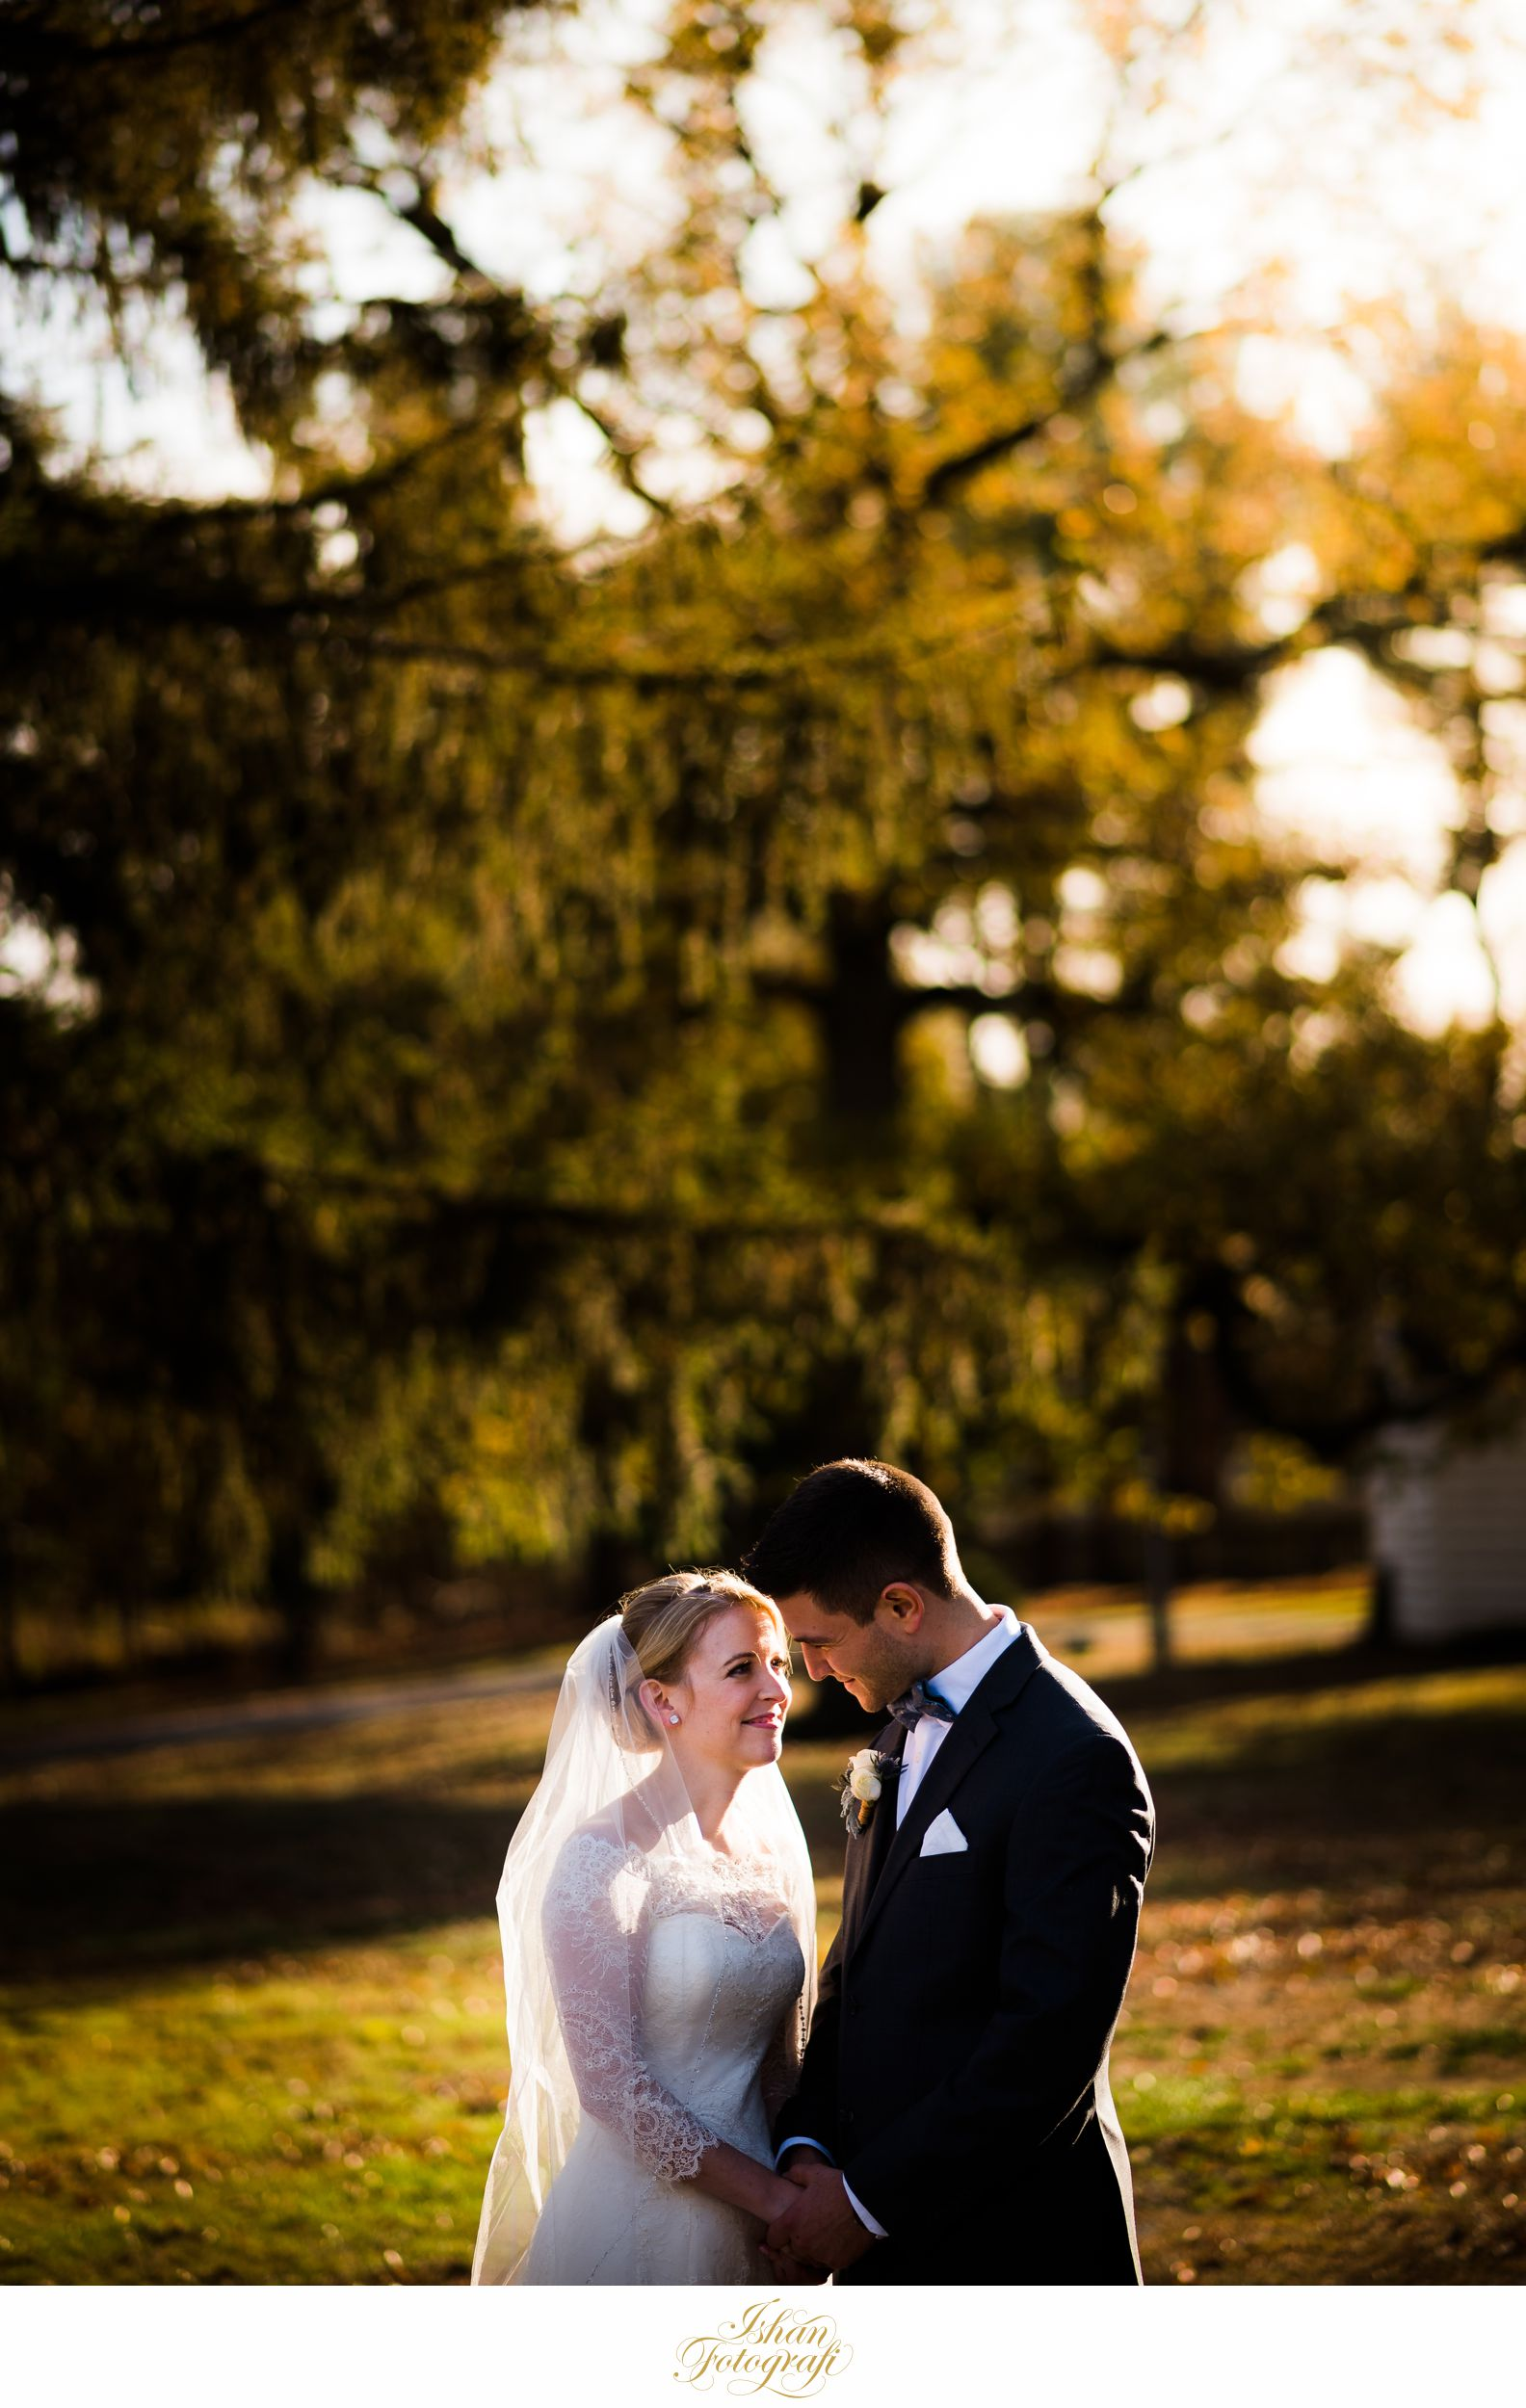 davids-country-inn-nj-wedding-photos